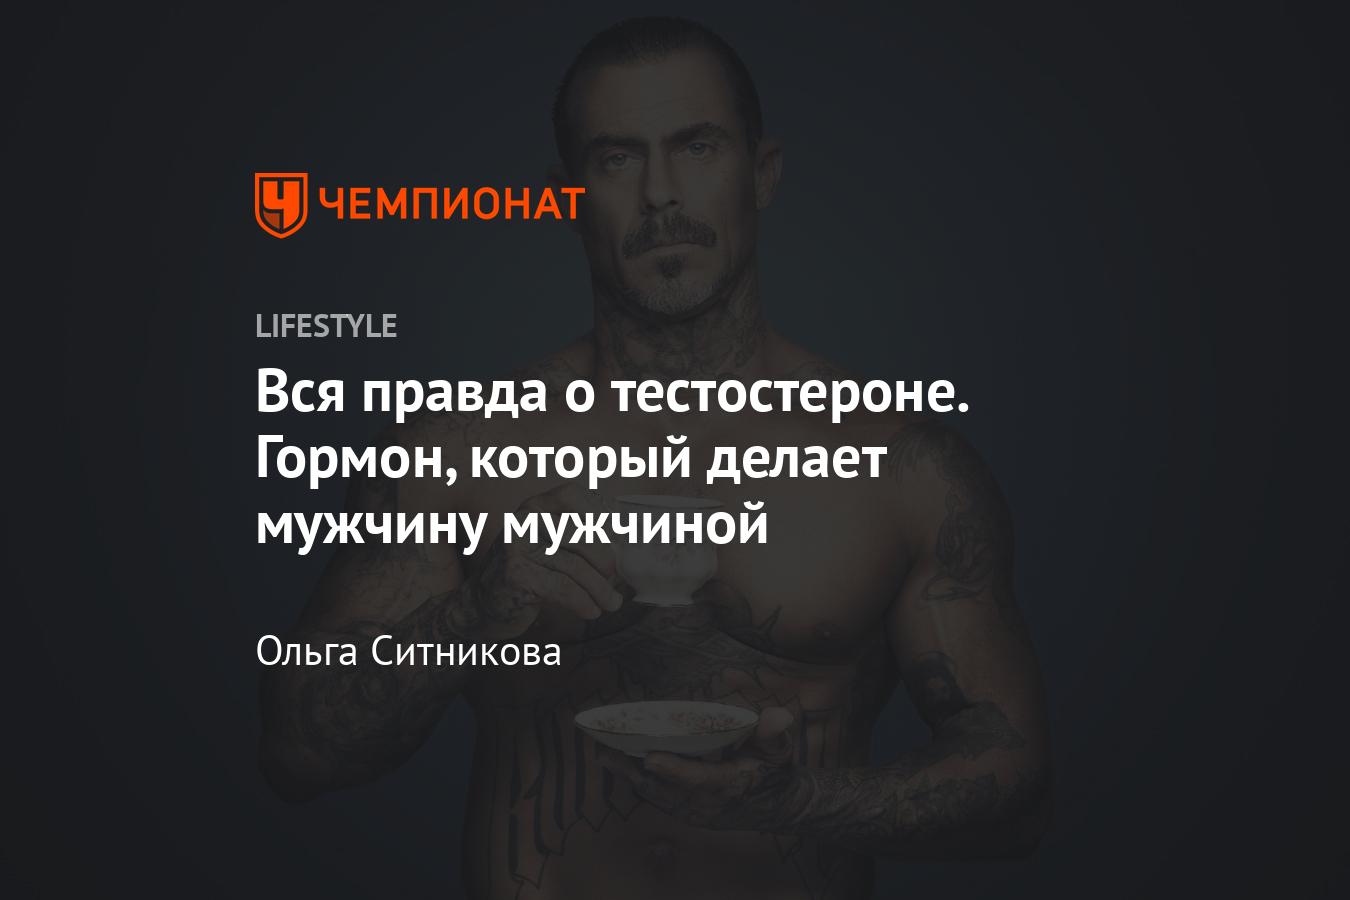 Общий тестостерон — норма у мужчин